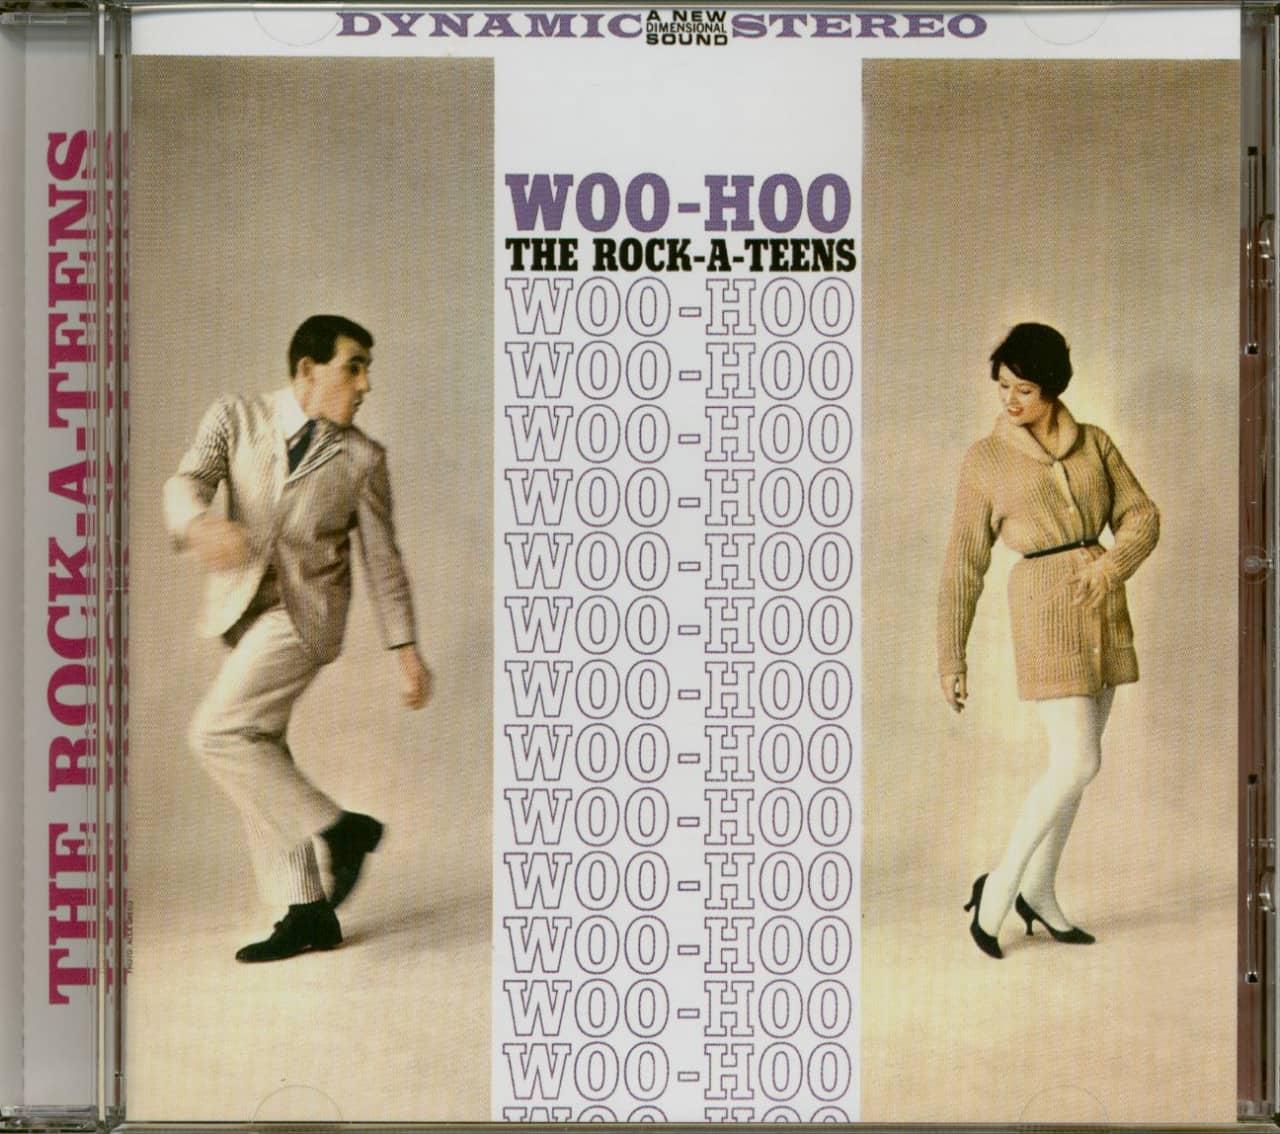 The Rock-A-Teens - Woo-Hoo (CD, Mono & Stereo)